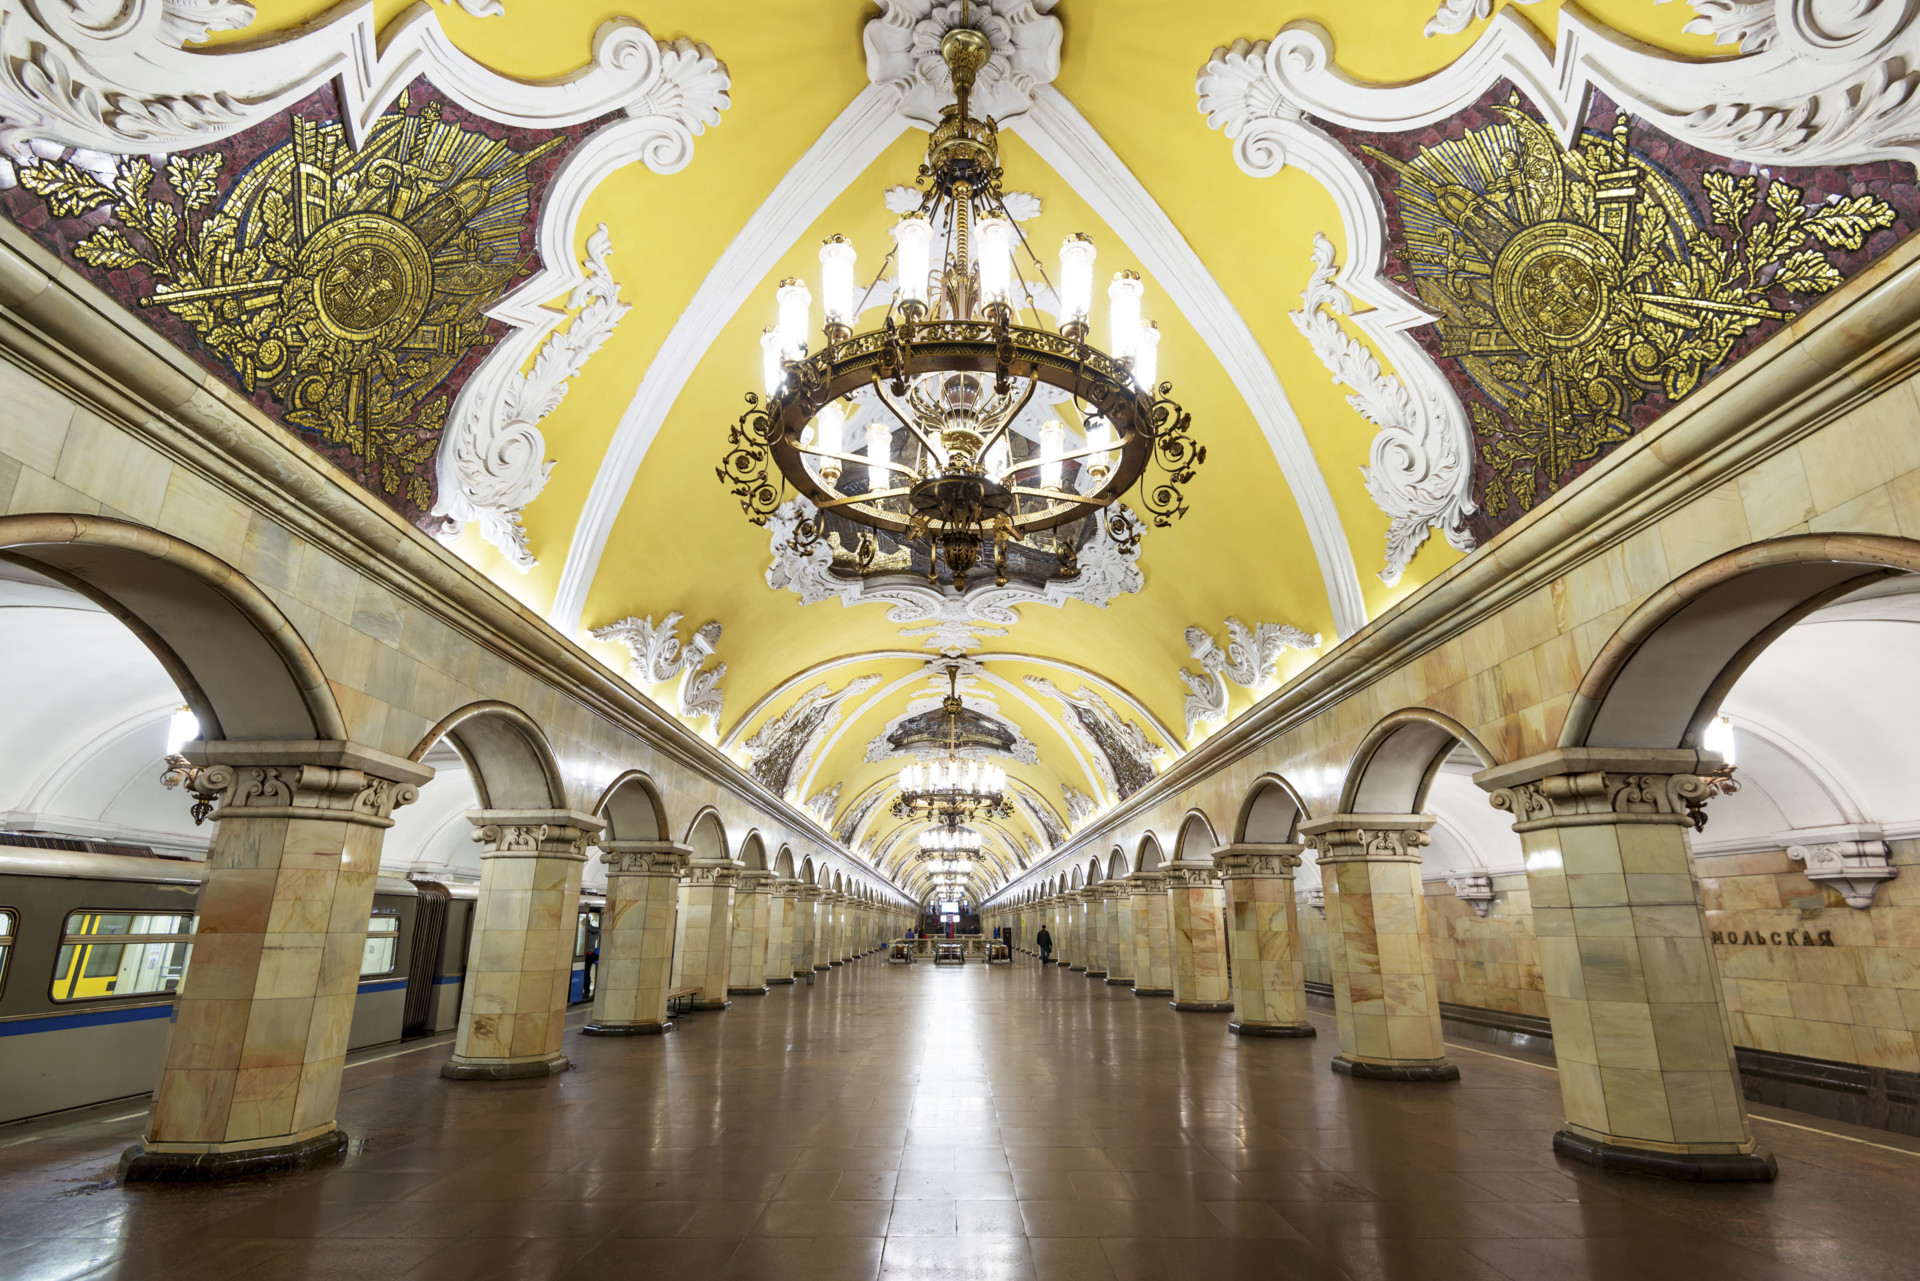 Estação Komsomolskaya em Moscovo, Rússia